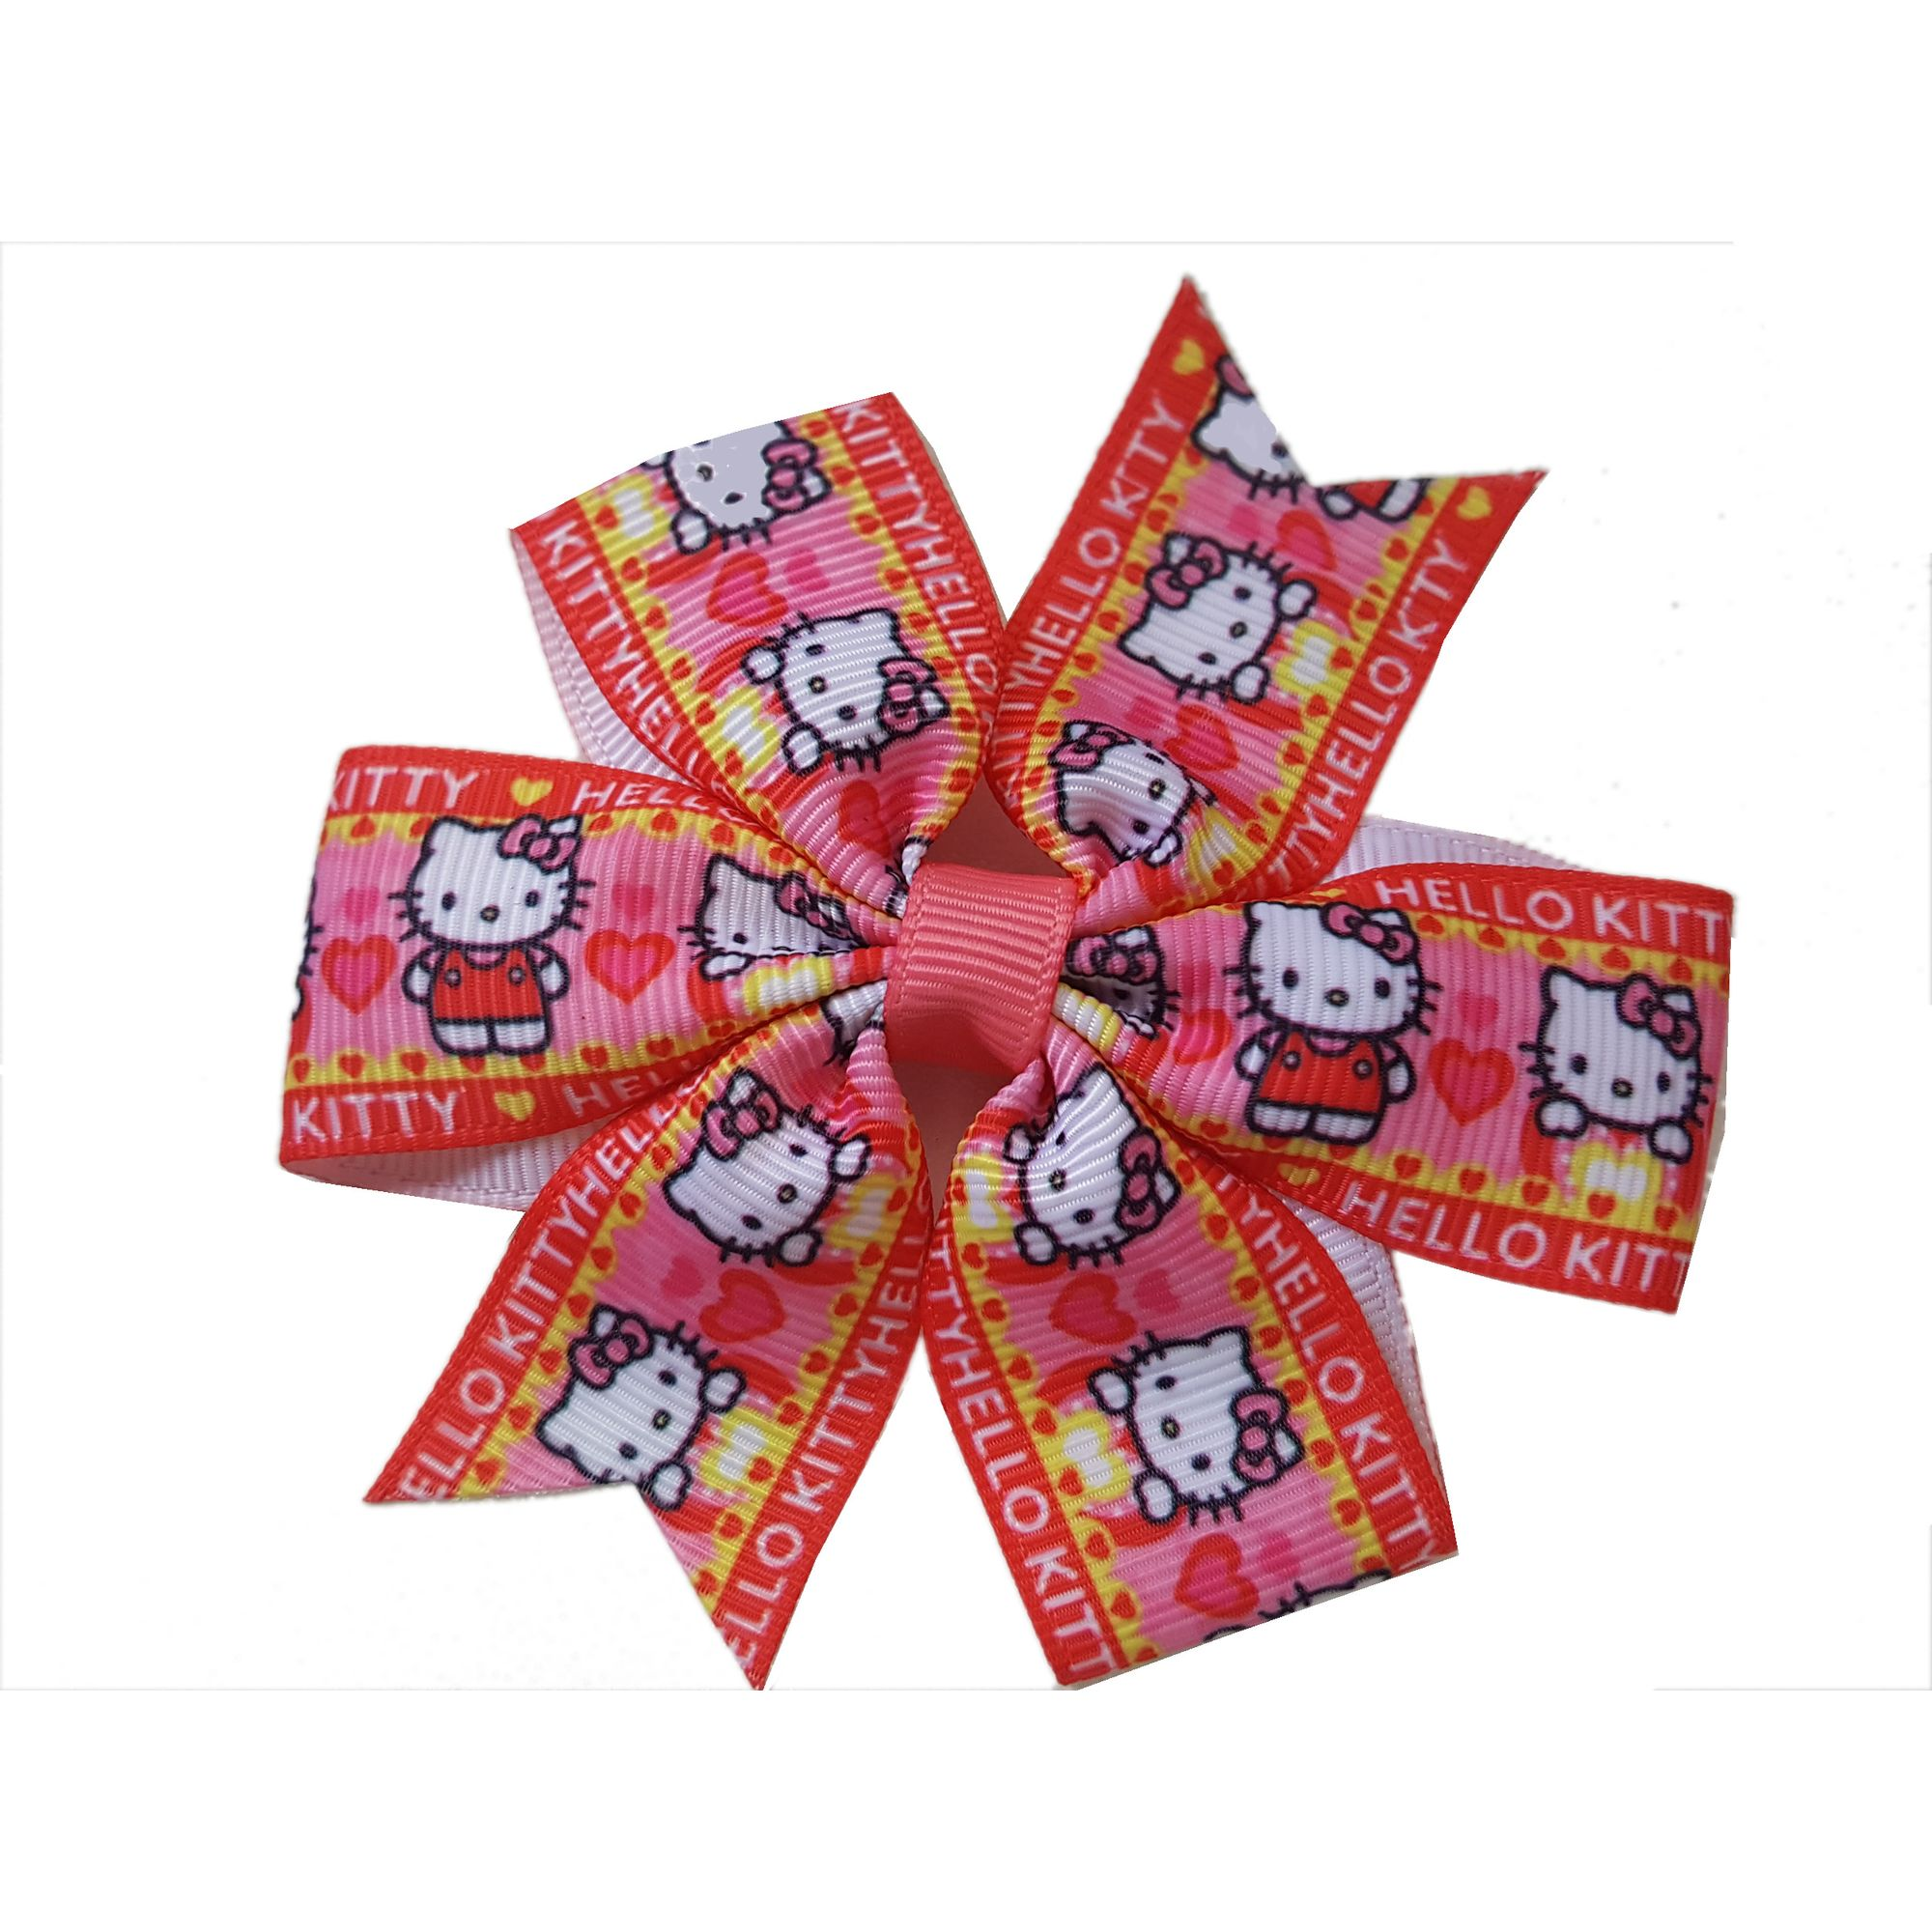 laco-para-cabelo-infantil-Hello-Kitty--Rosa-M-lacos-da-sorte-loja-ecameleca-kids-